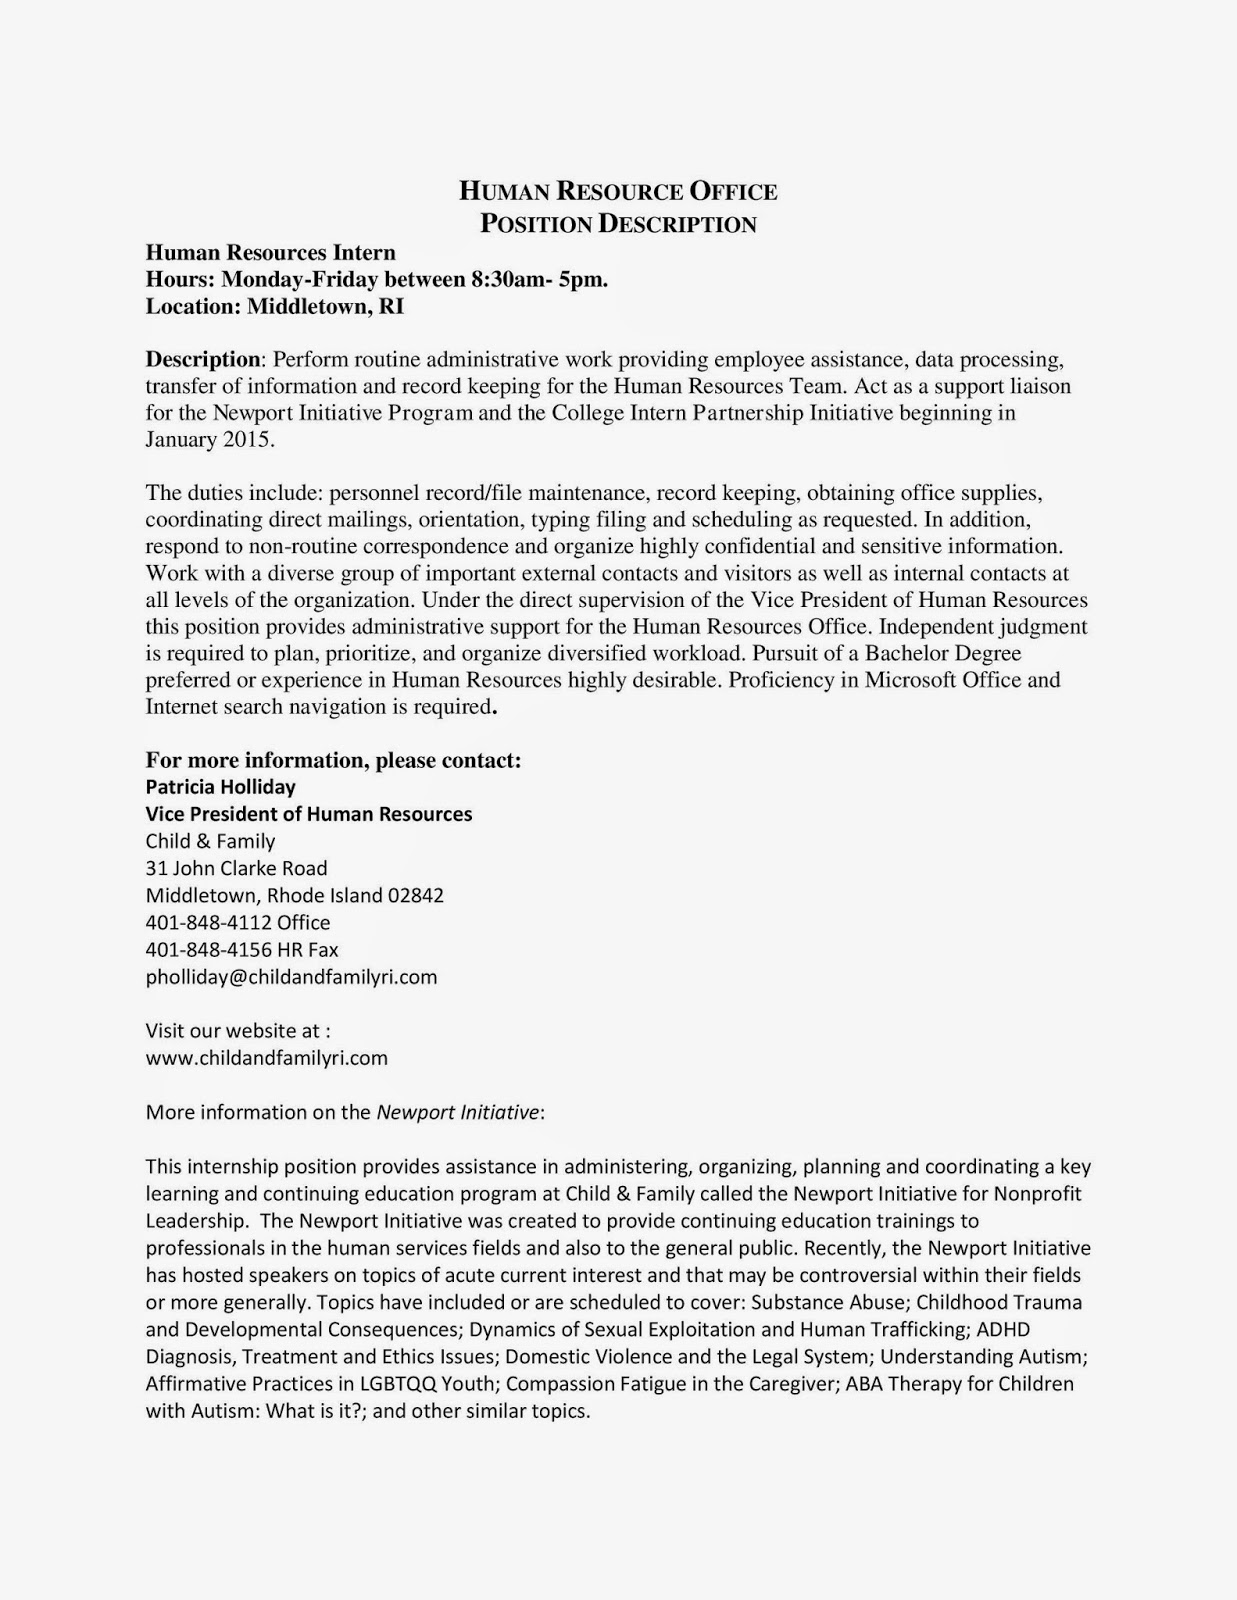 Newport Initiative Program   Human Resources Intern